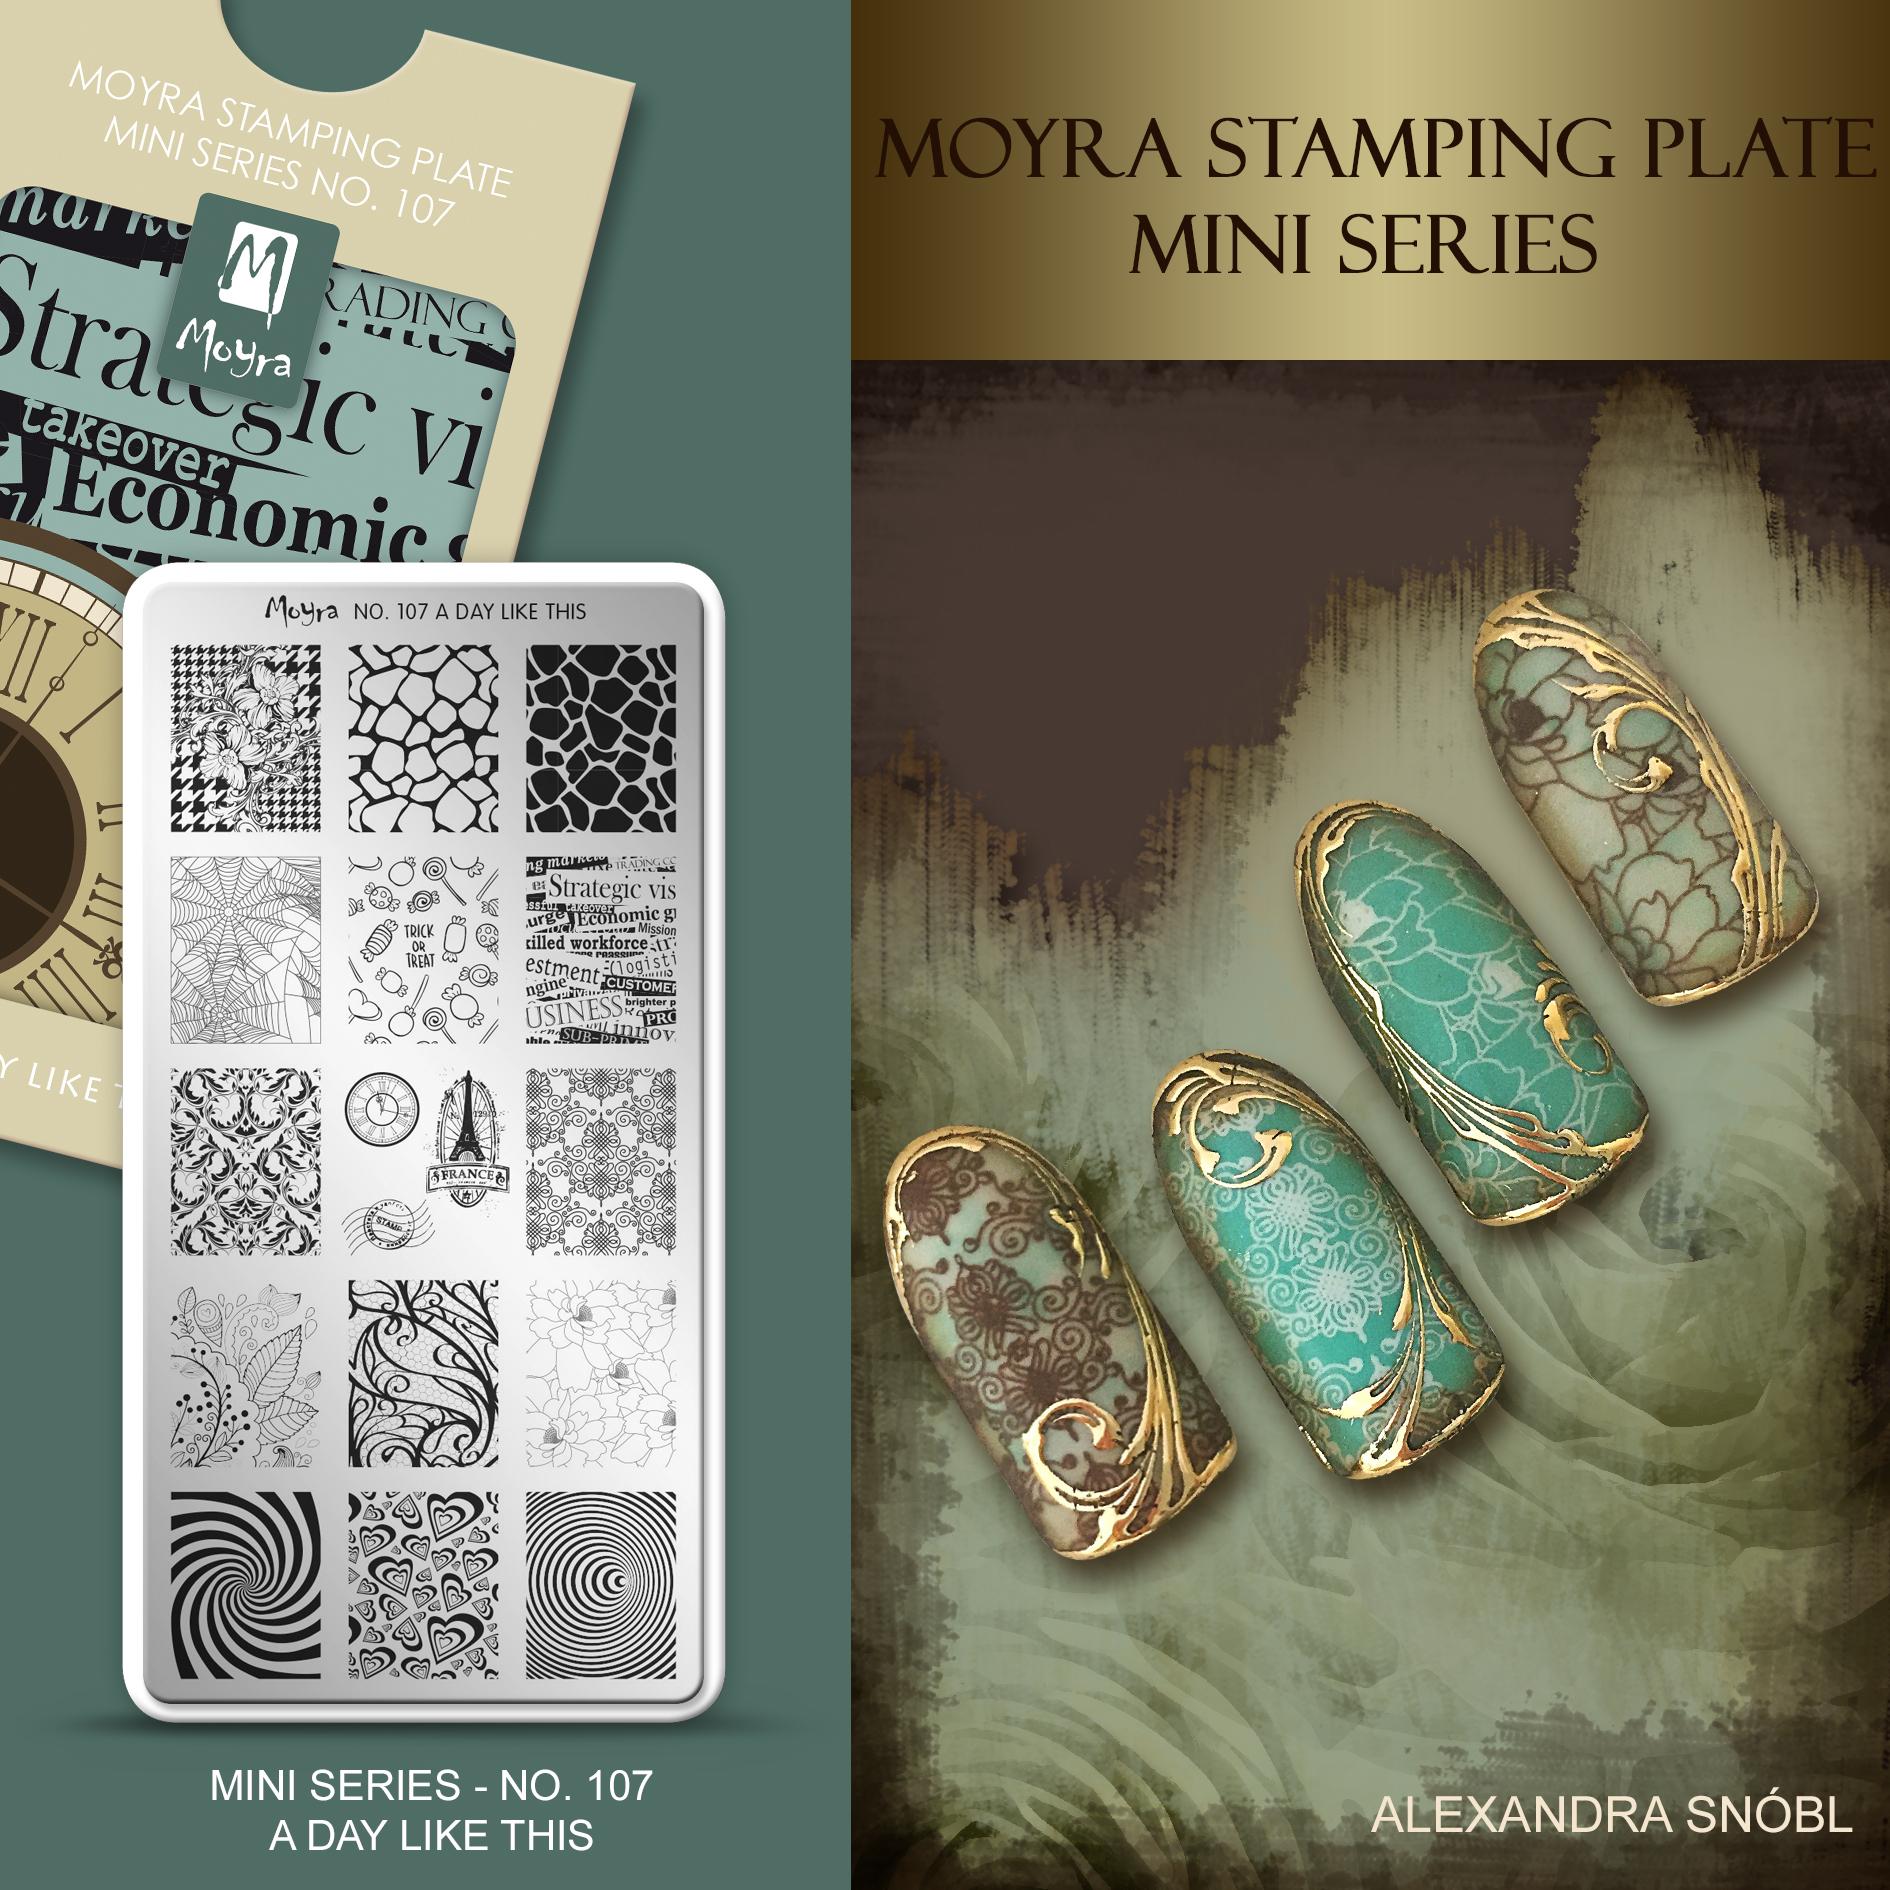 Moyra Nail Art Stamping Plate Mini Series No. 107 A day like this